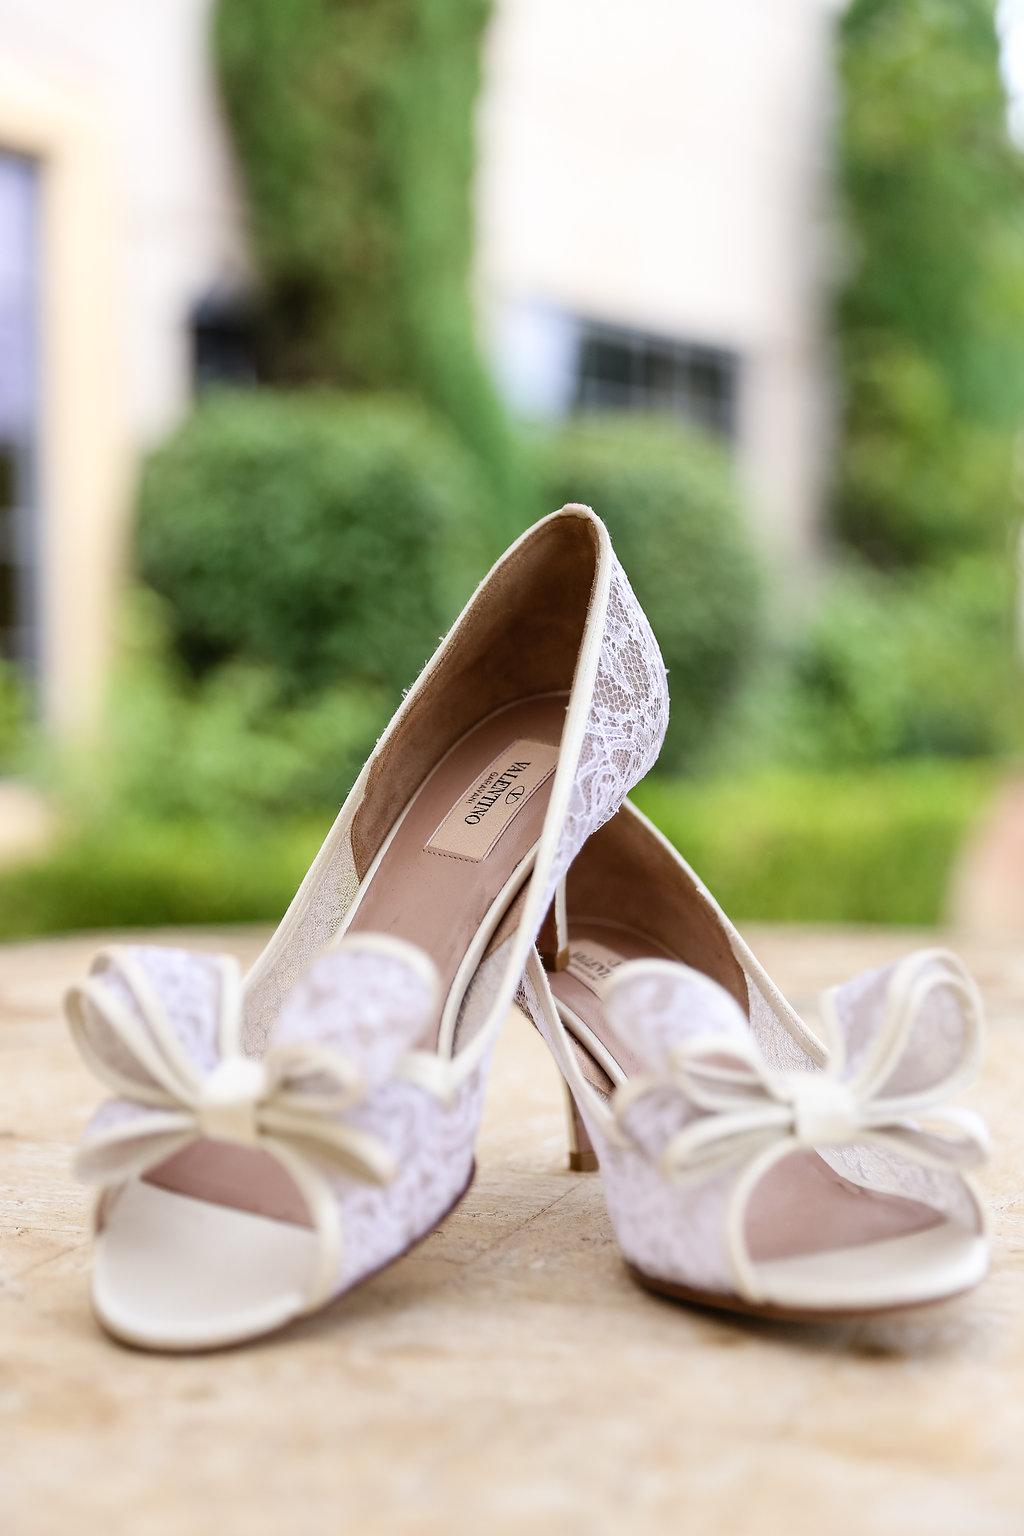 Gorgeous White Wedding Shoes - Gorgeous Seal Beach Wedding Venue - Old Country Club Wedding